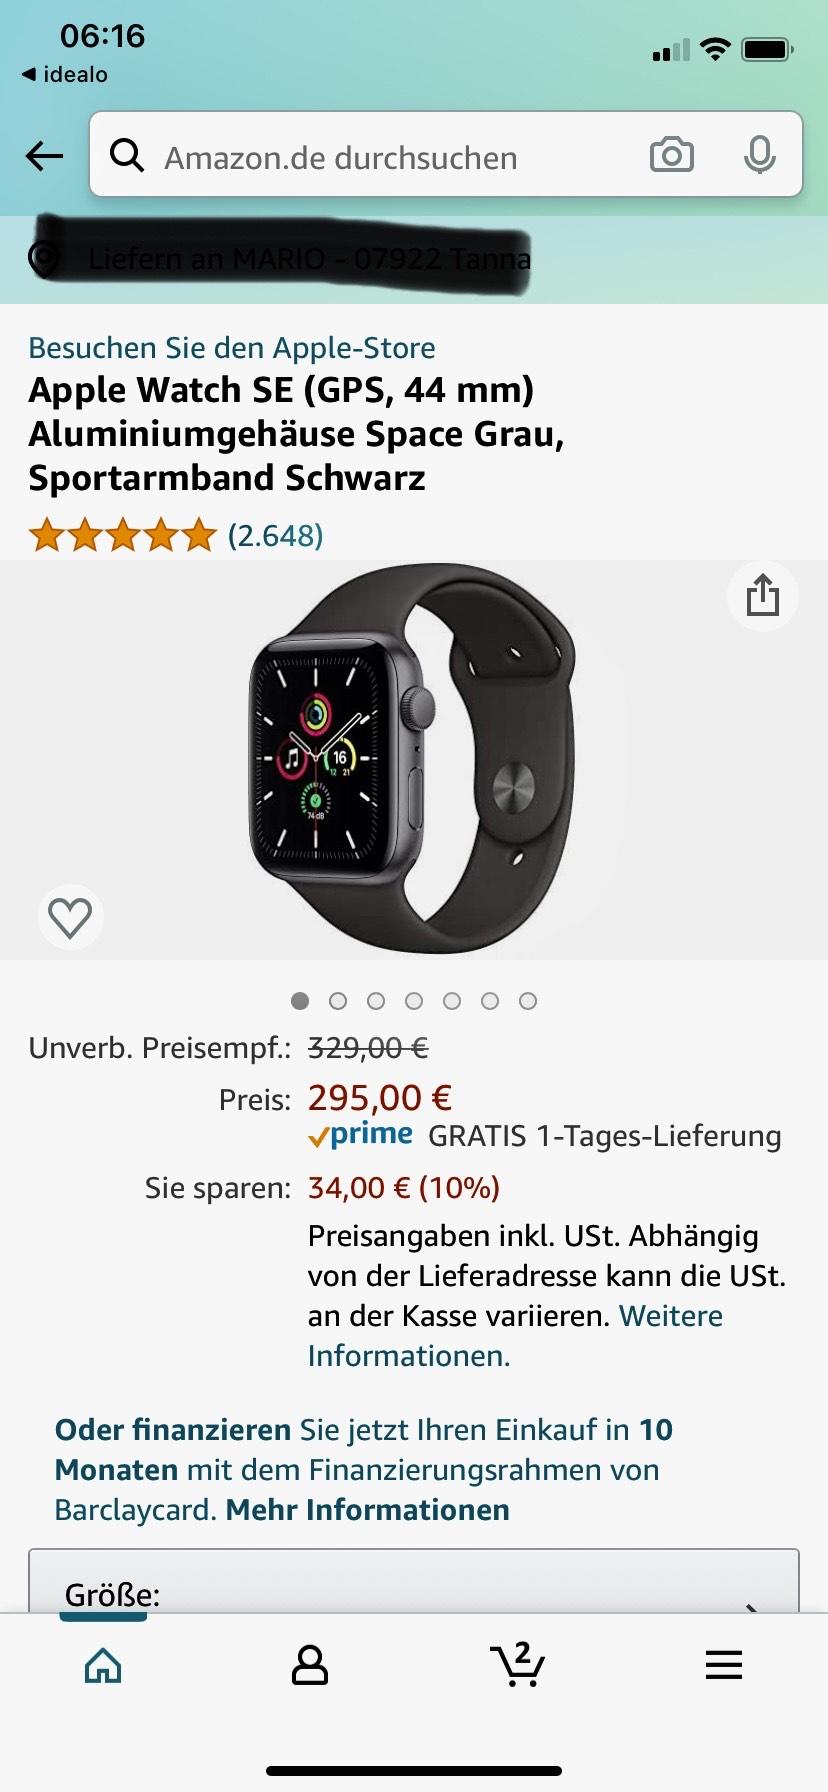 Apple Watch SE (GPS, 44 mm) Aluminiumgehäuse Space Grau, Sportarmband Schwarz